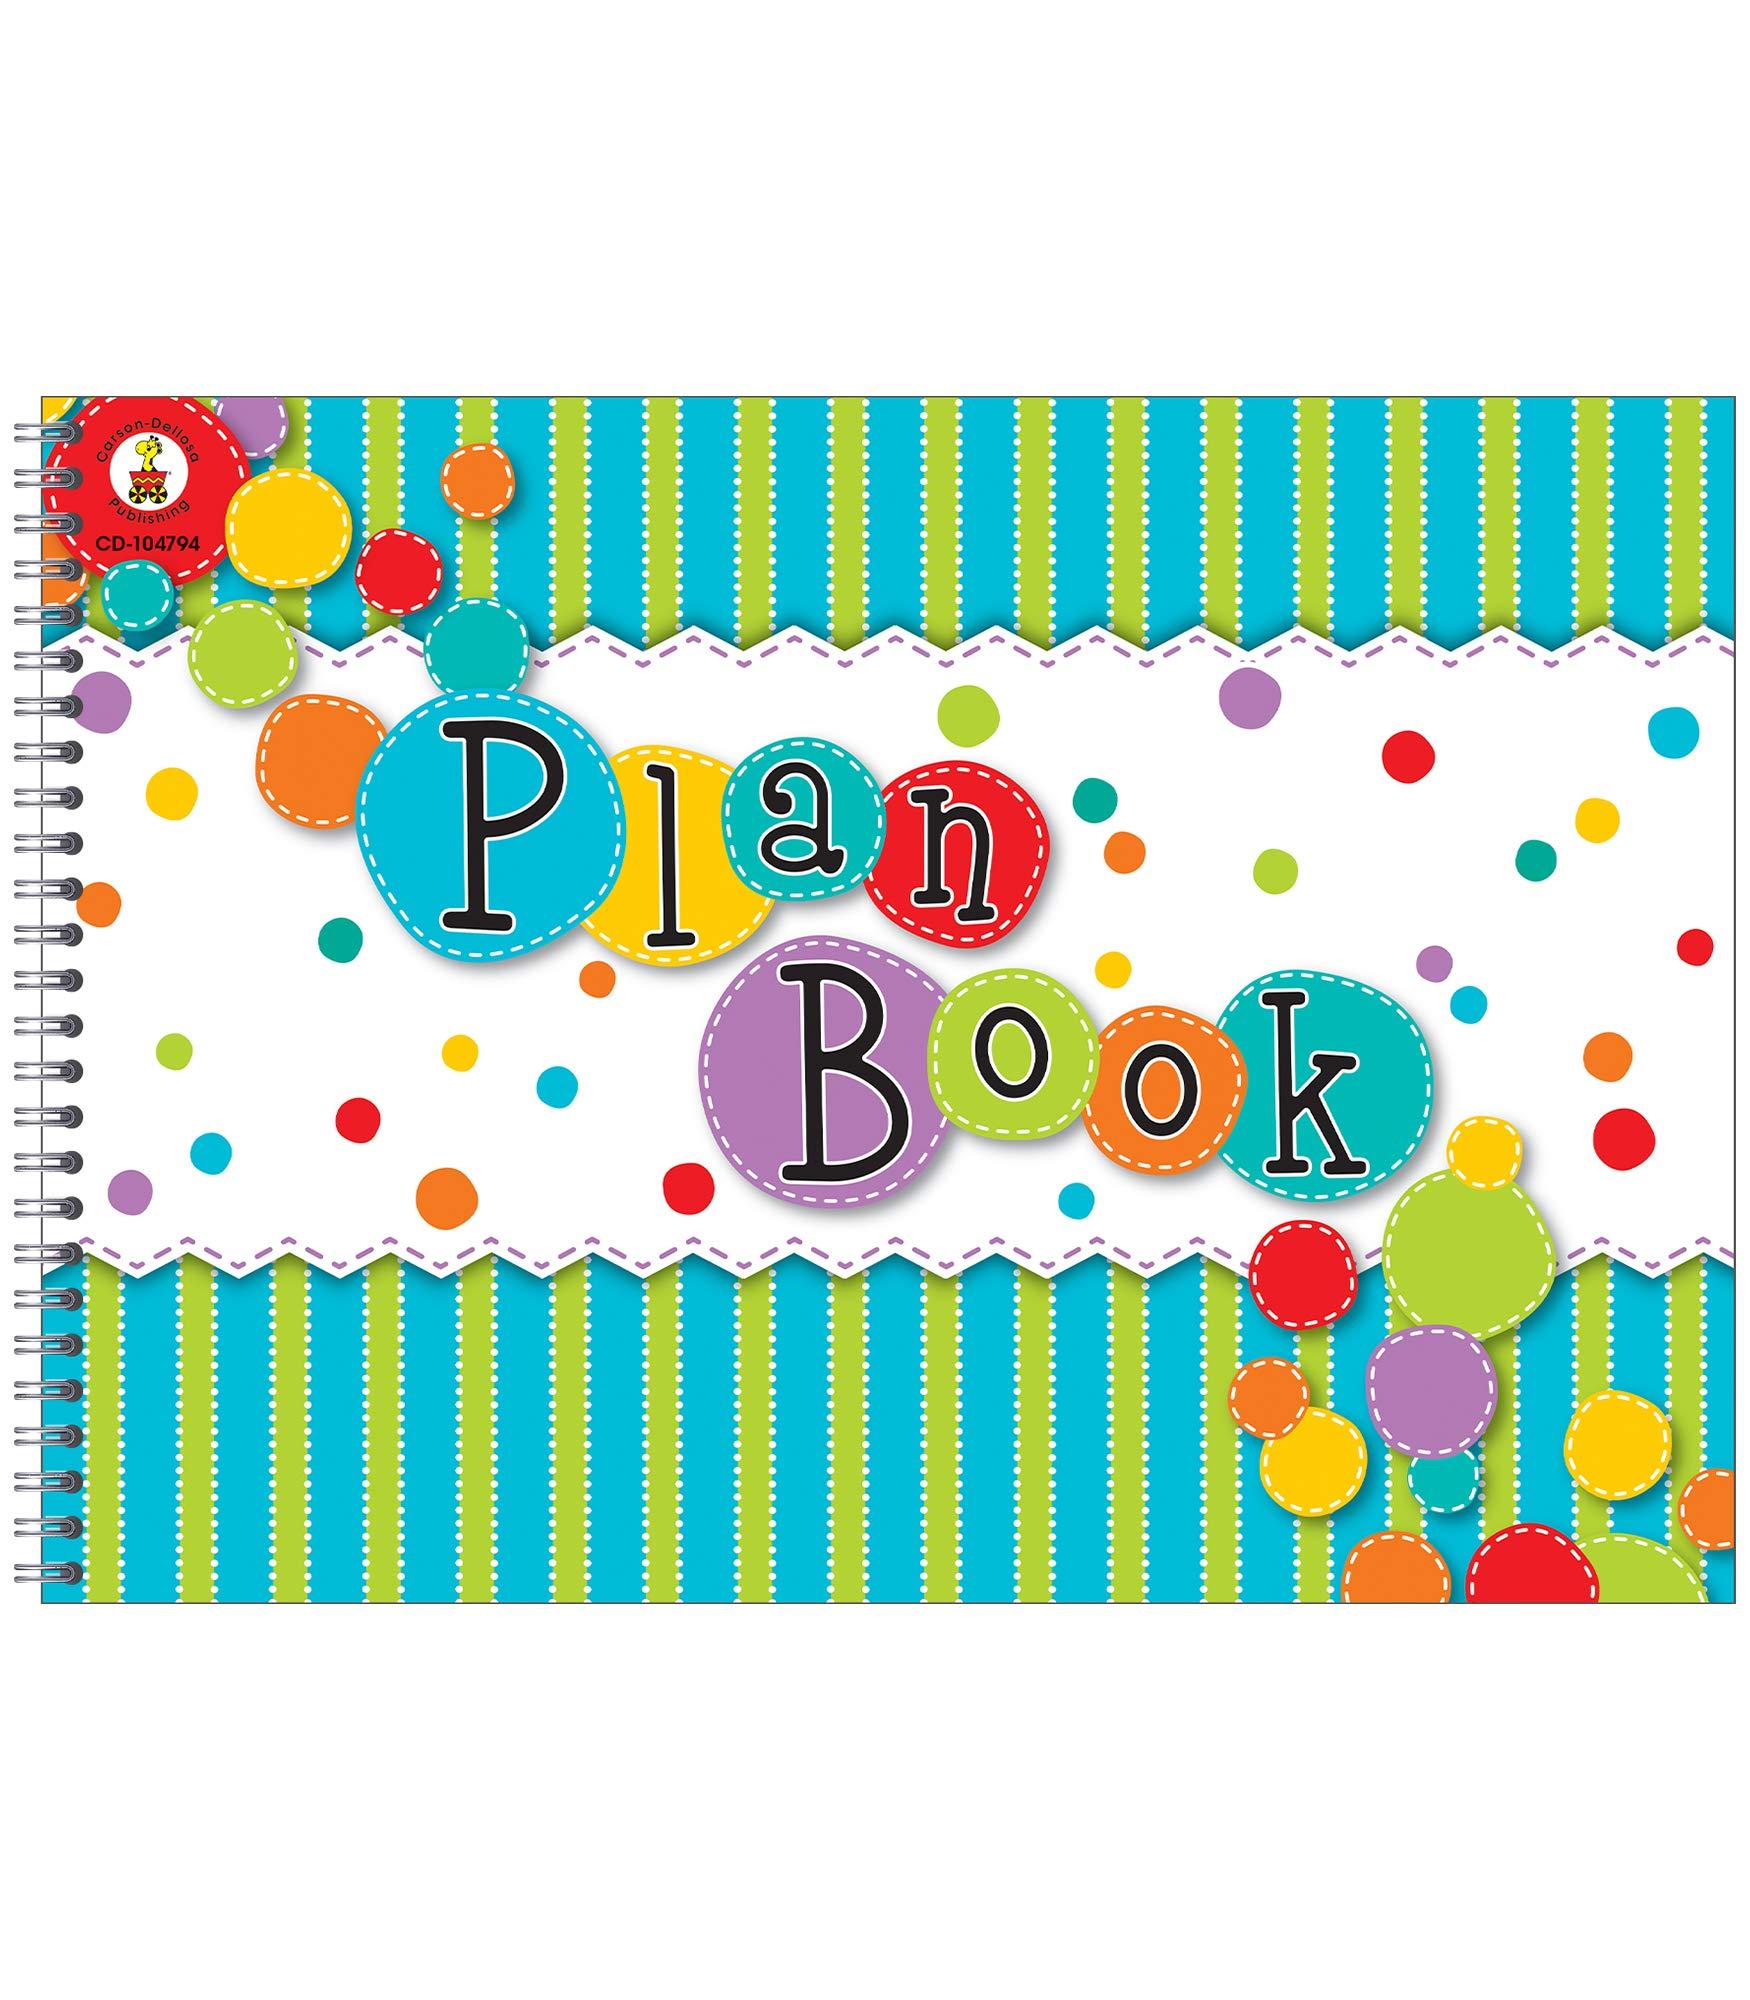 Carson Dellosa Fresh Sorbet Large Academic Teacher Planner Undated Daily Weekly Lesson Plan Book And Record Organizer For Classroom Or Homeschool 9 25 X 13 Carson Dellosa Publishing 9781483803753 Amazon Com Books